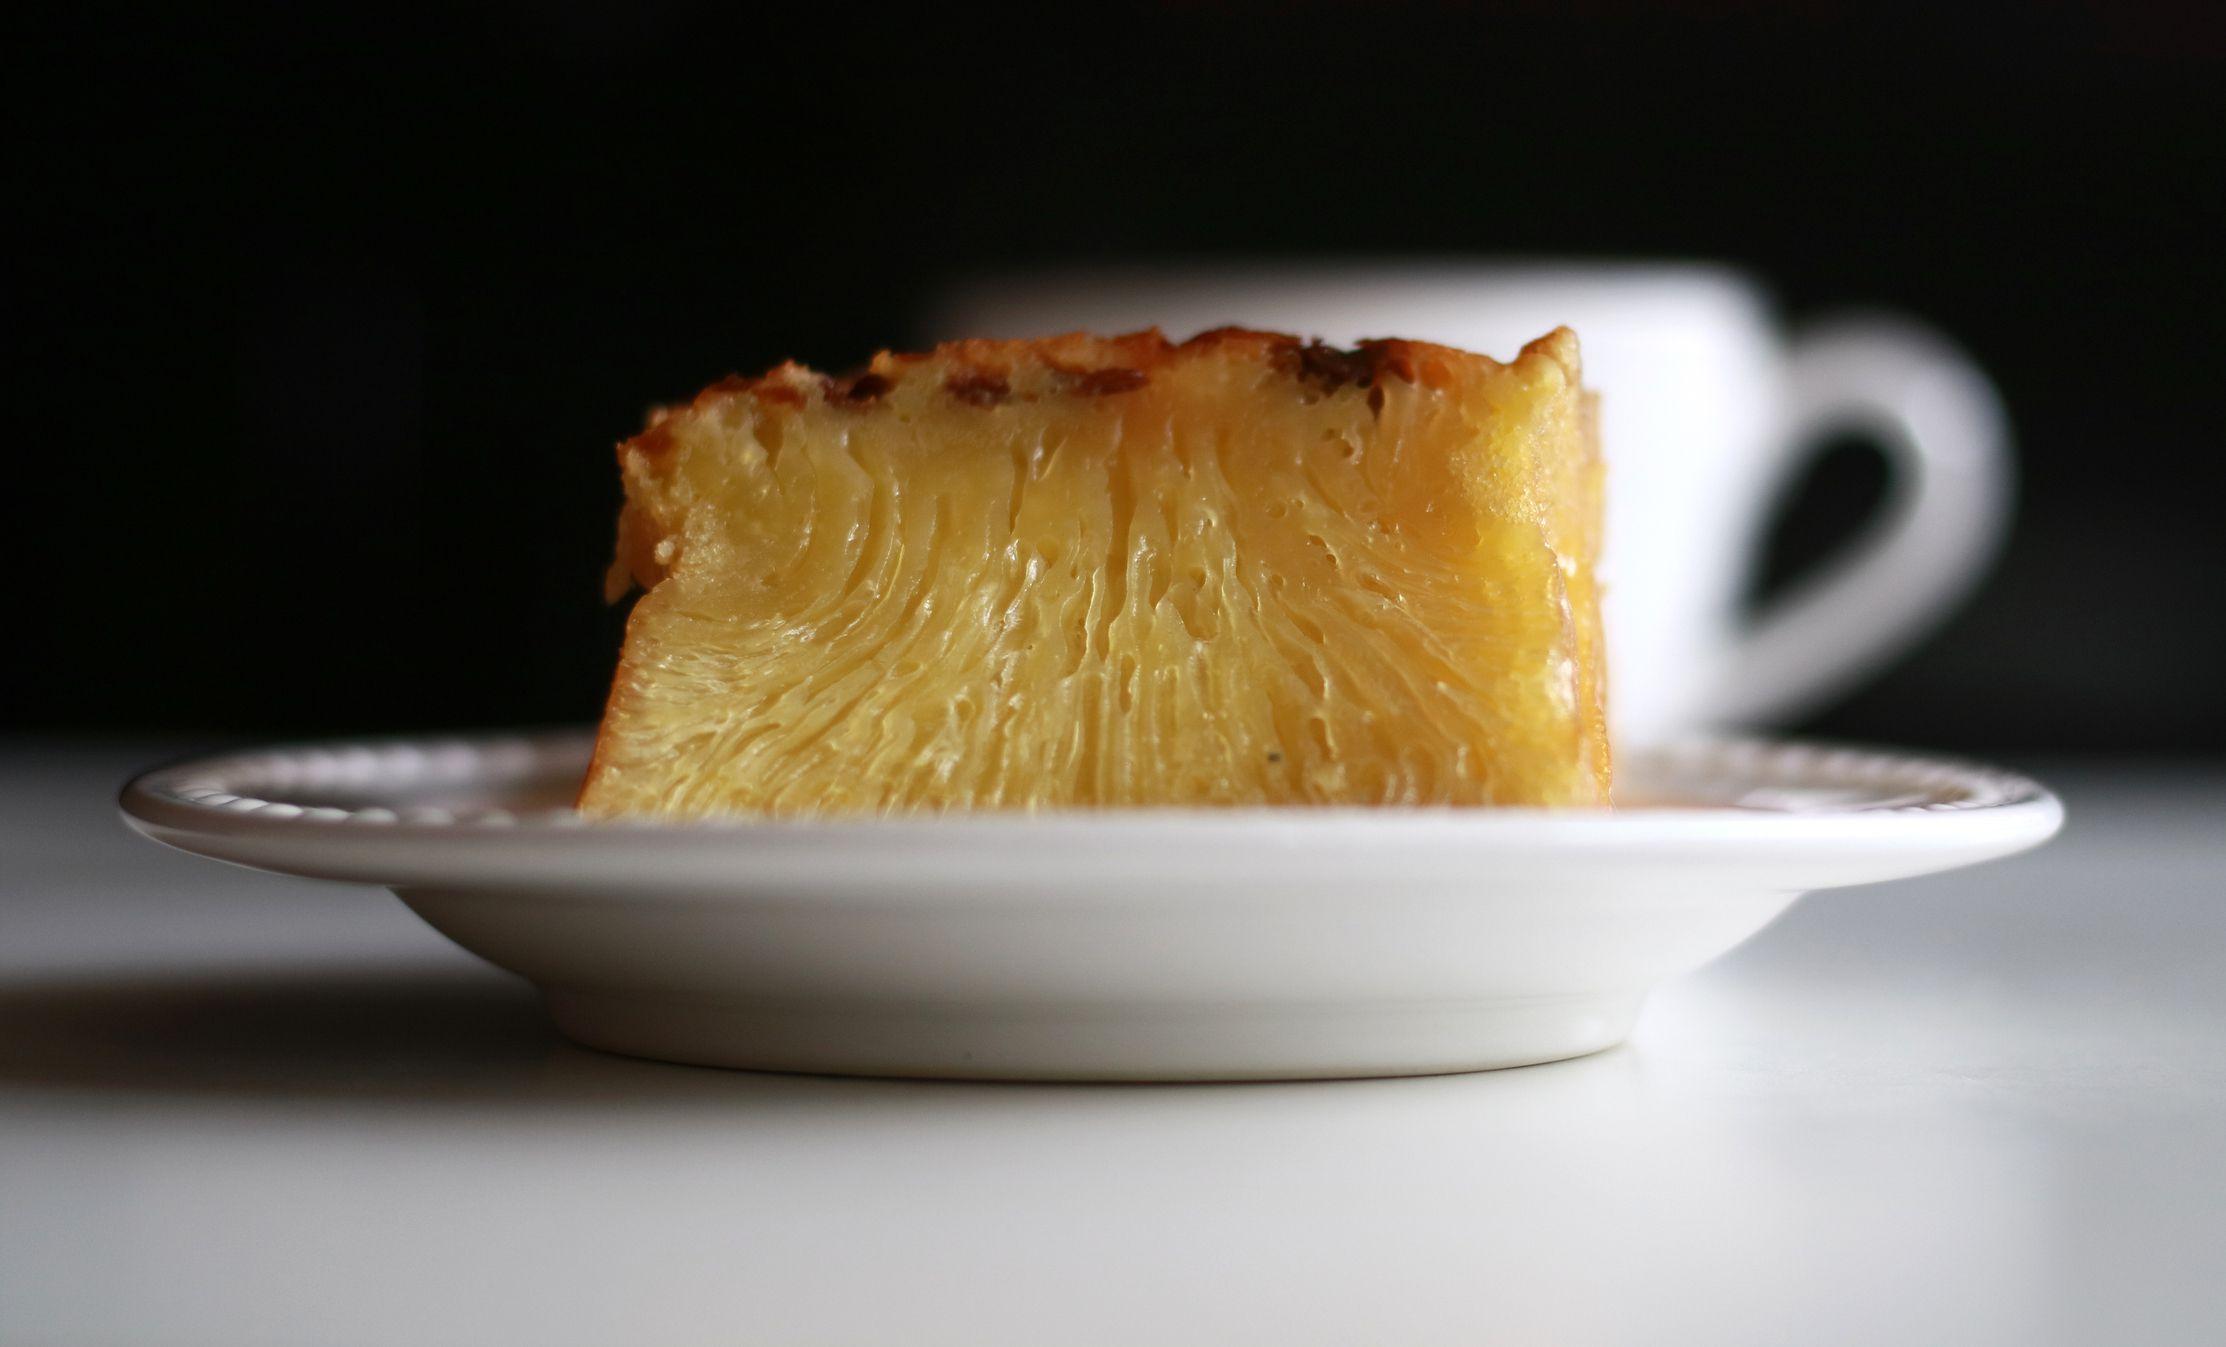 Bika Ambon. Indonesian honeycomb cake. Popular cake from Medan, North Sumatra, Indonesia.